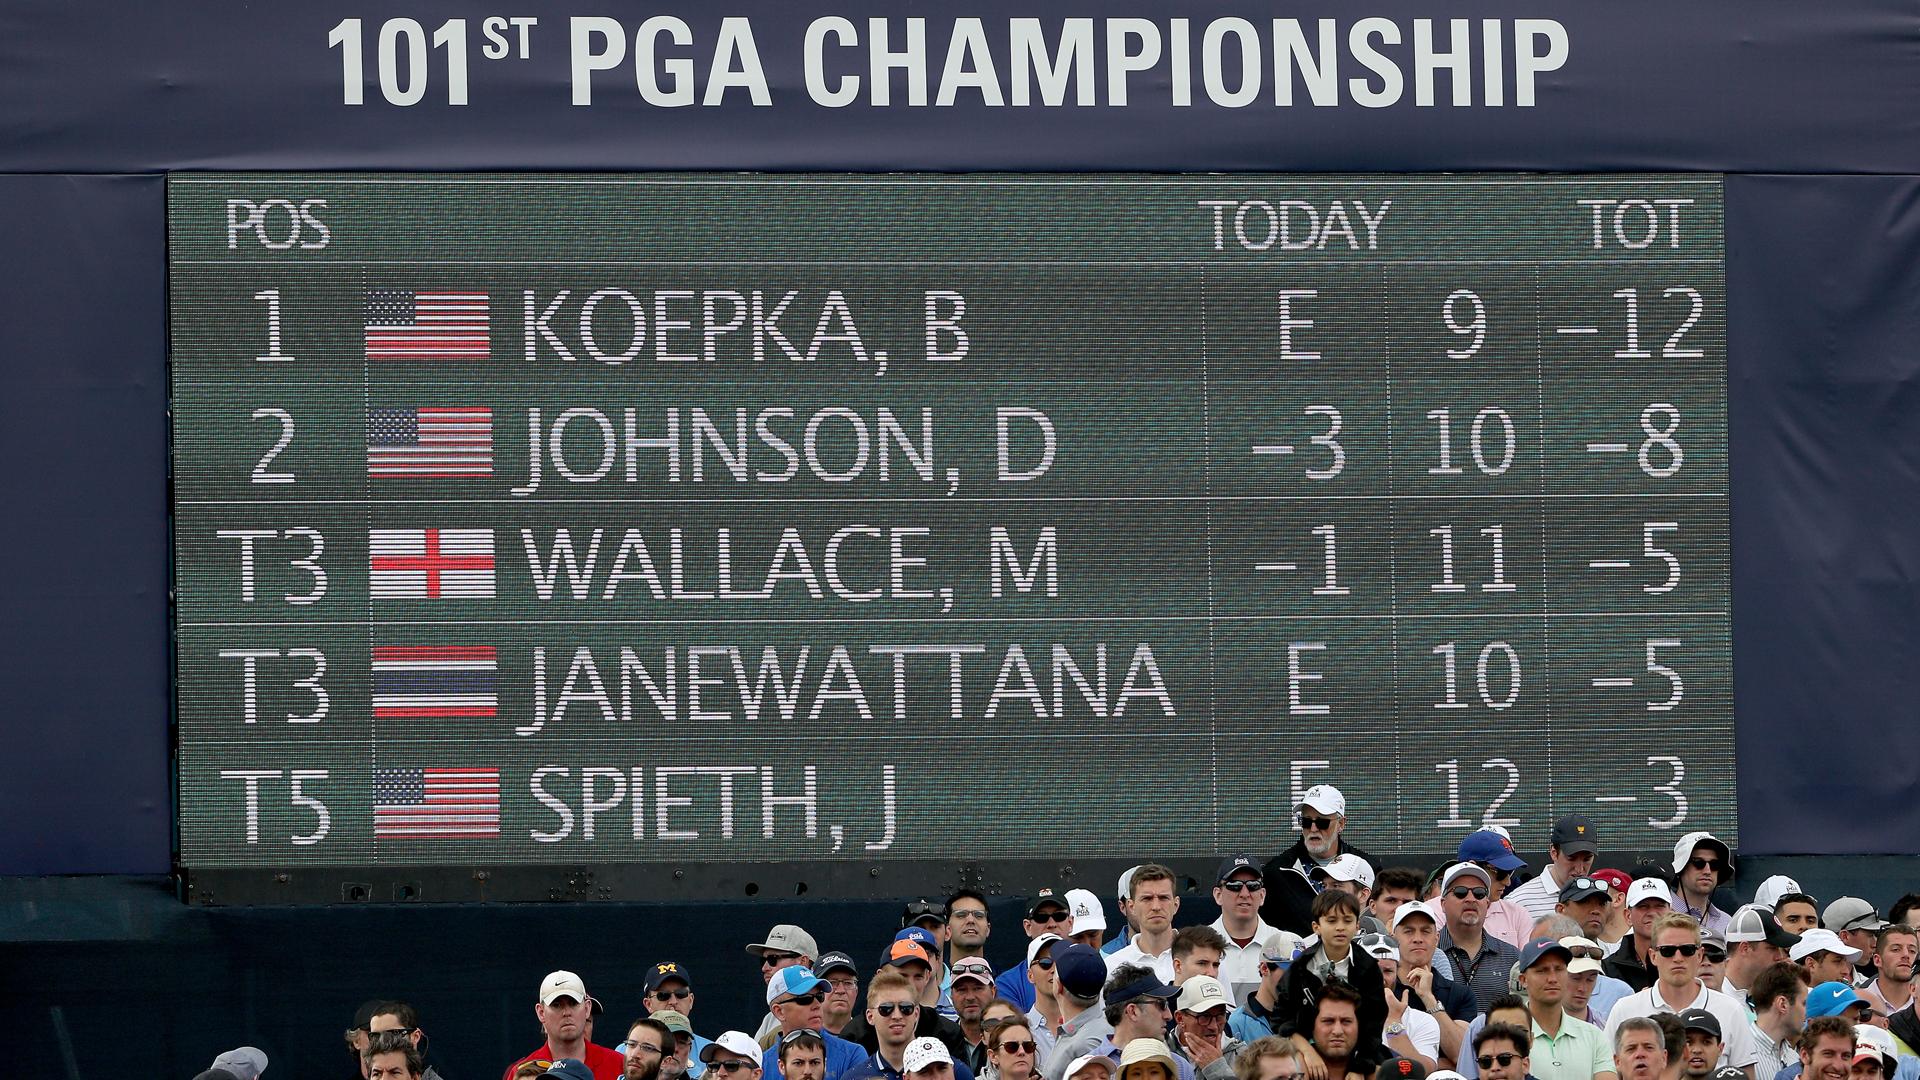 Coronavirus: US PGA Championship postponed, PGA Tour off until at least May